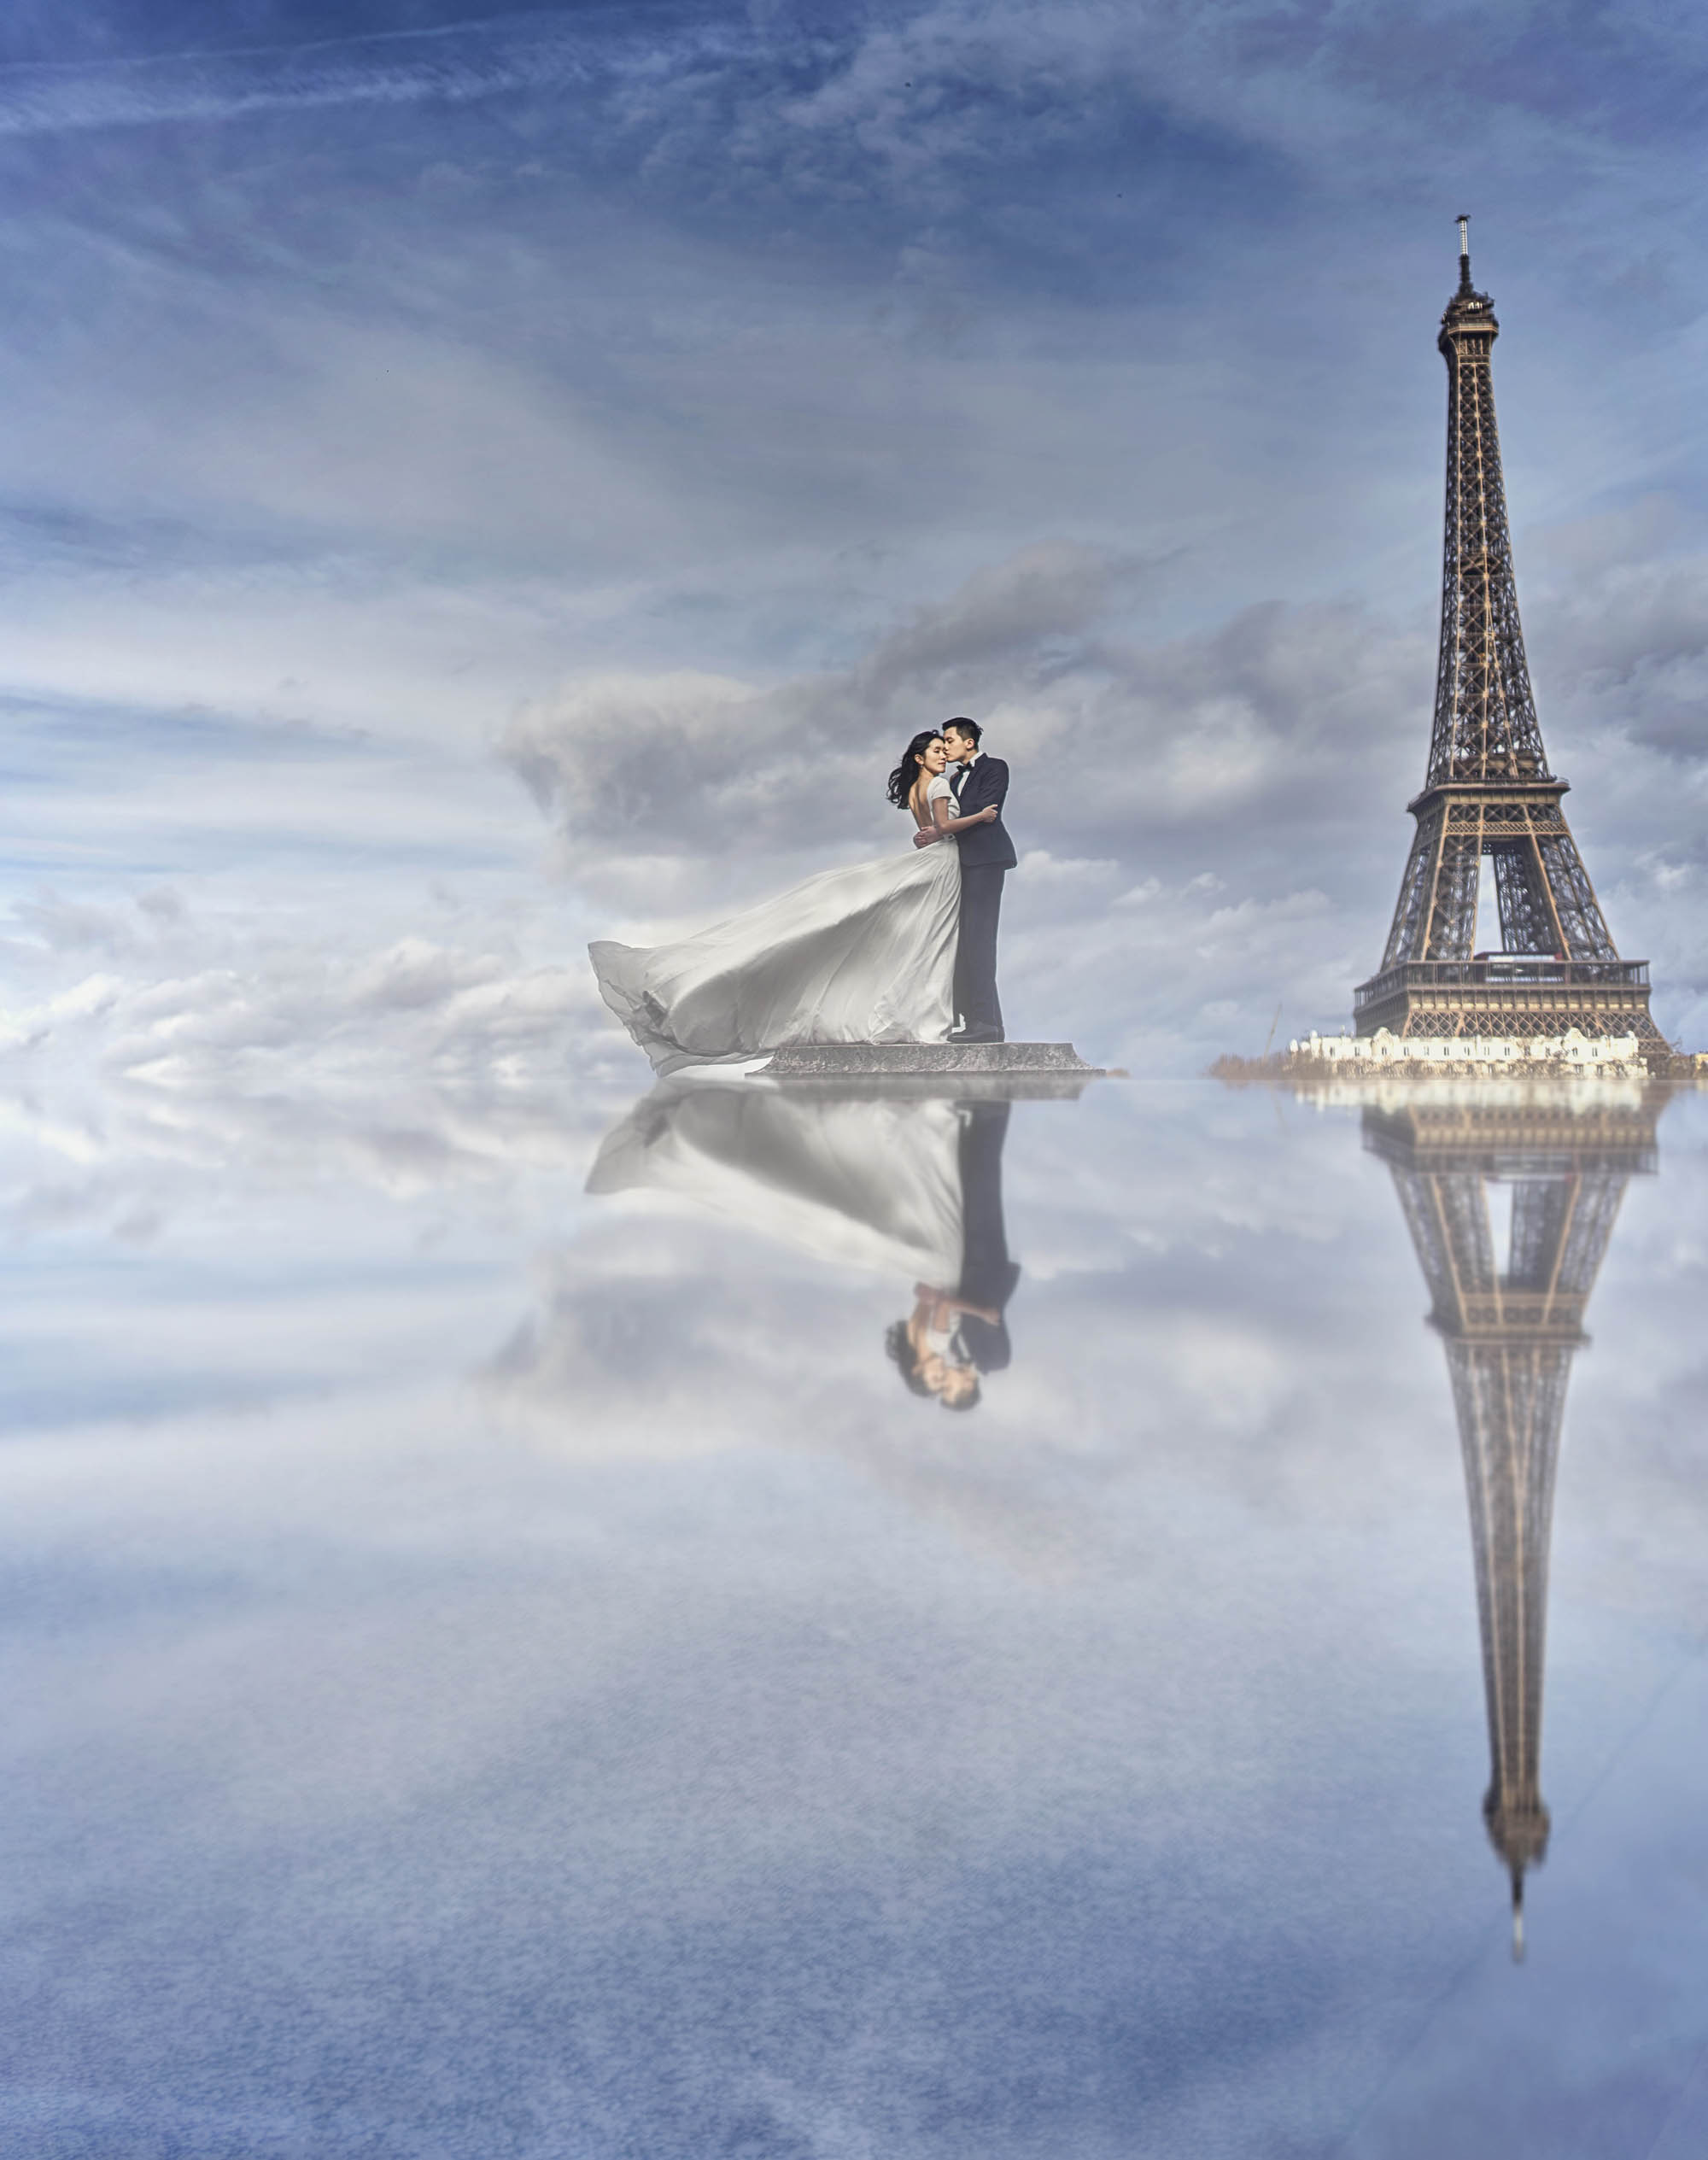 bride-and-groom-glass-reflection-eiffel-tower-worlds-best-wedding-photos-cm-leung-china-wedding-photographers